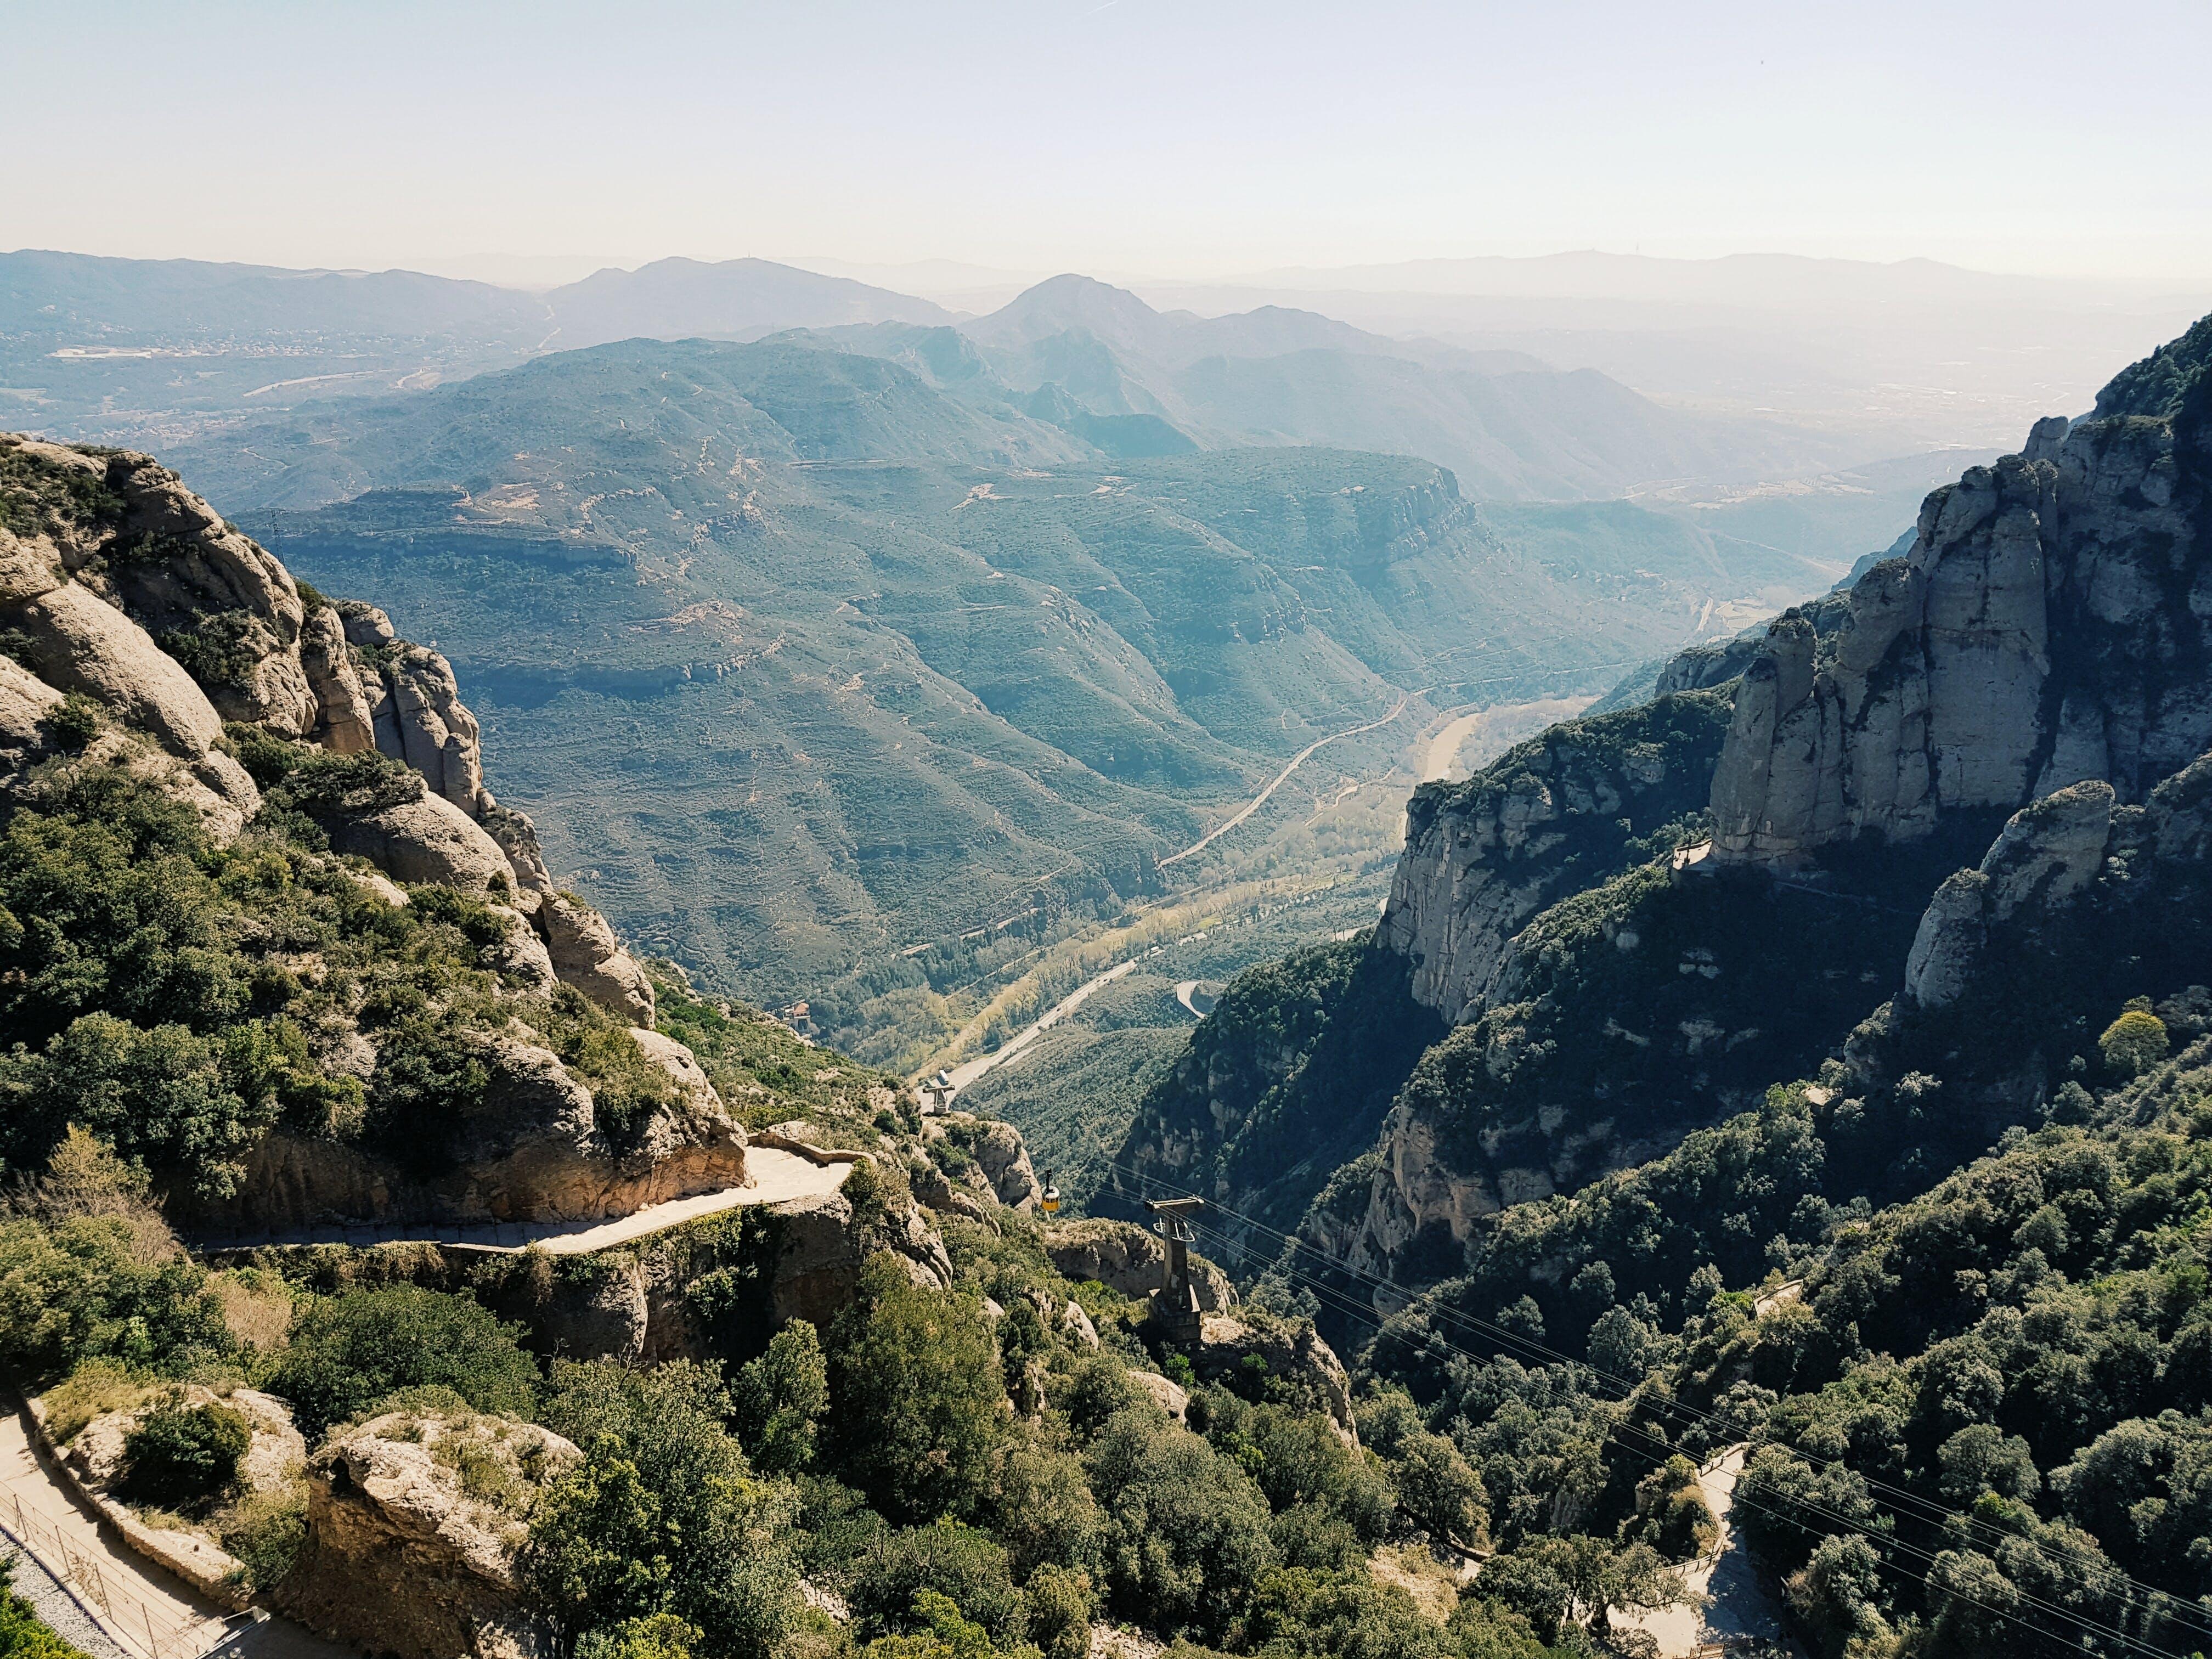 Gray Rock Mountain Surrounding Valley